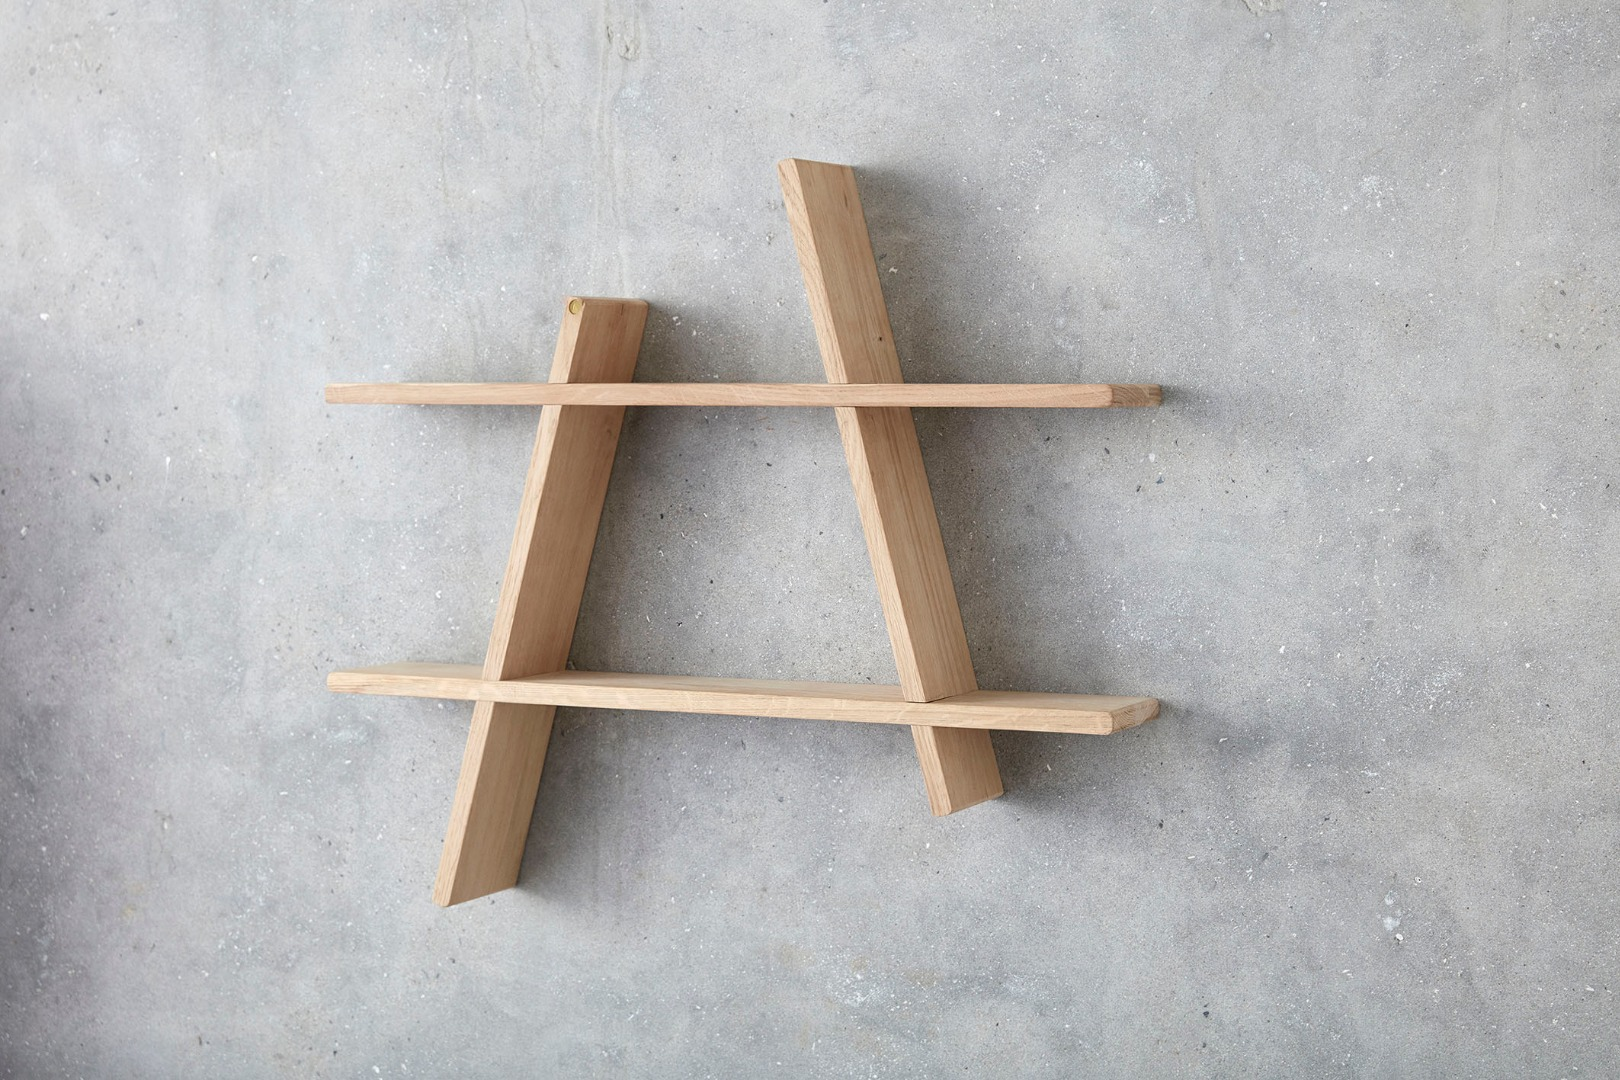 andersen-a-shelf-3